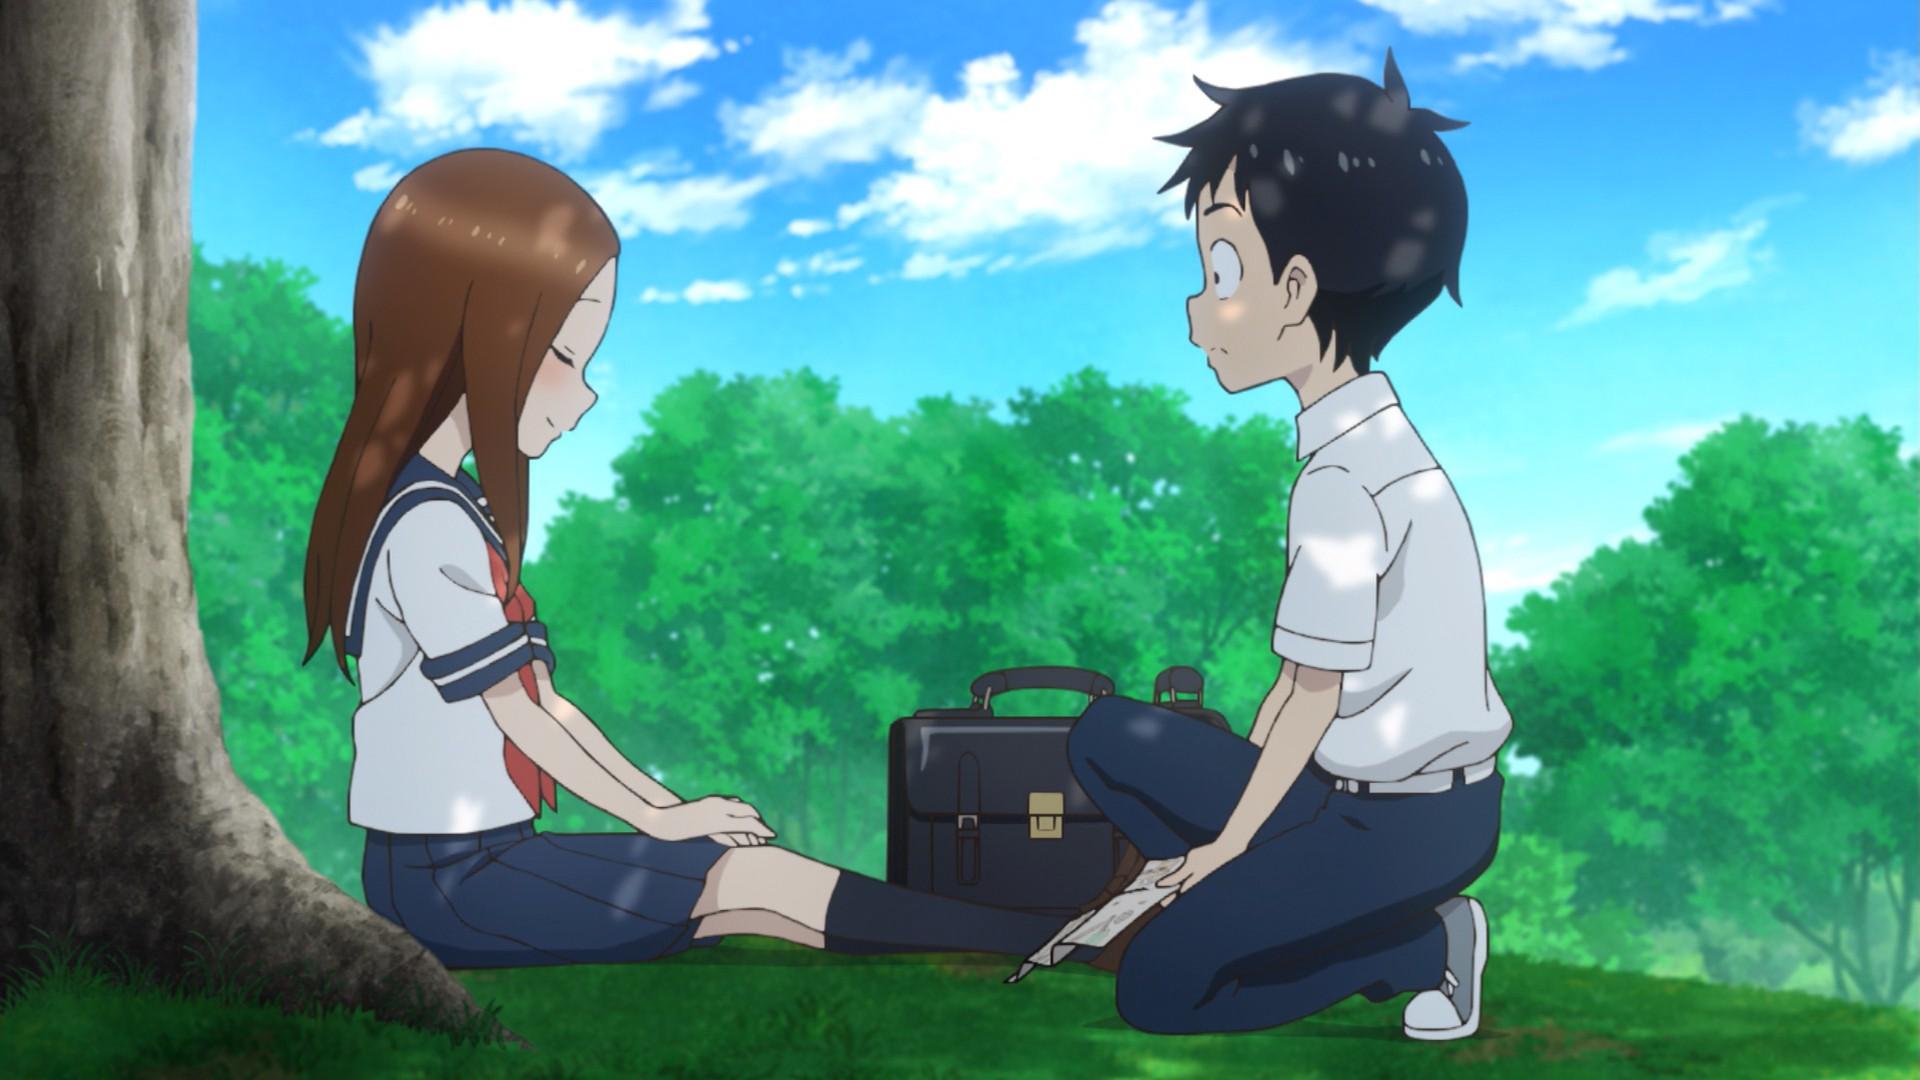 Karakai Jouzu No Takagi San 2 10 34 Lost In Anime